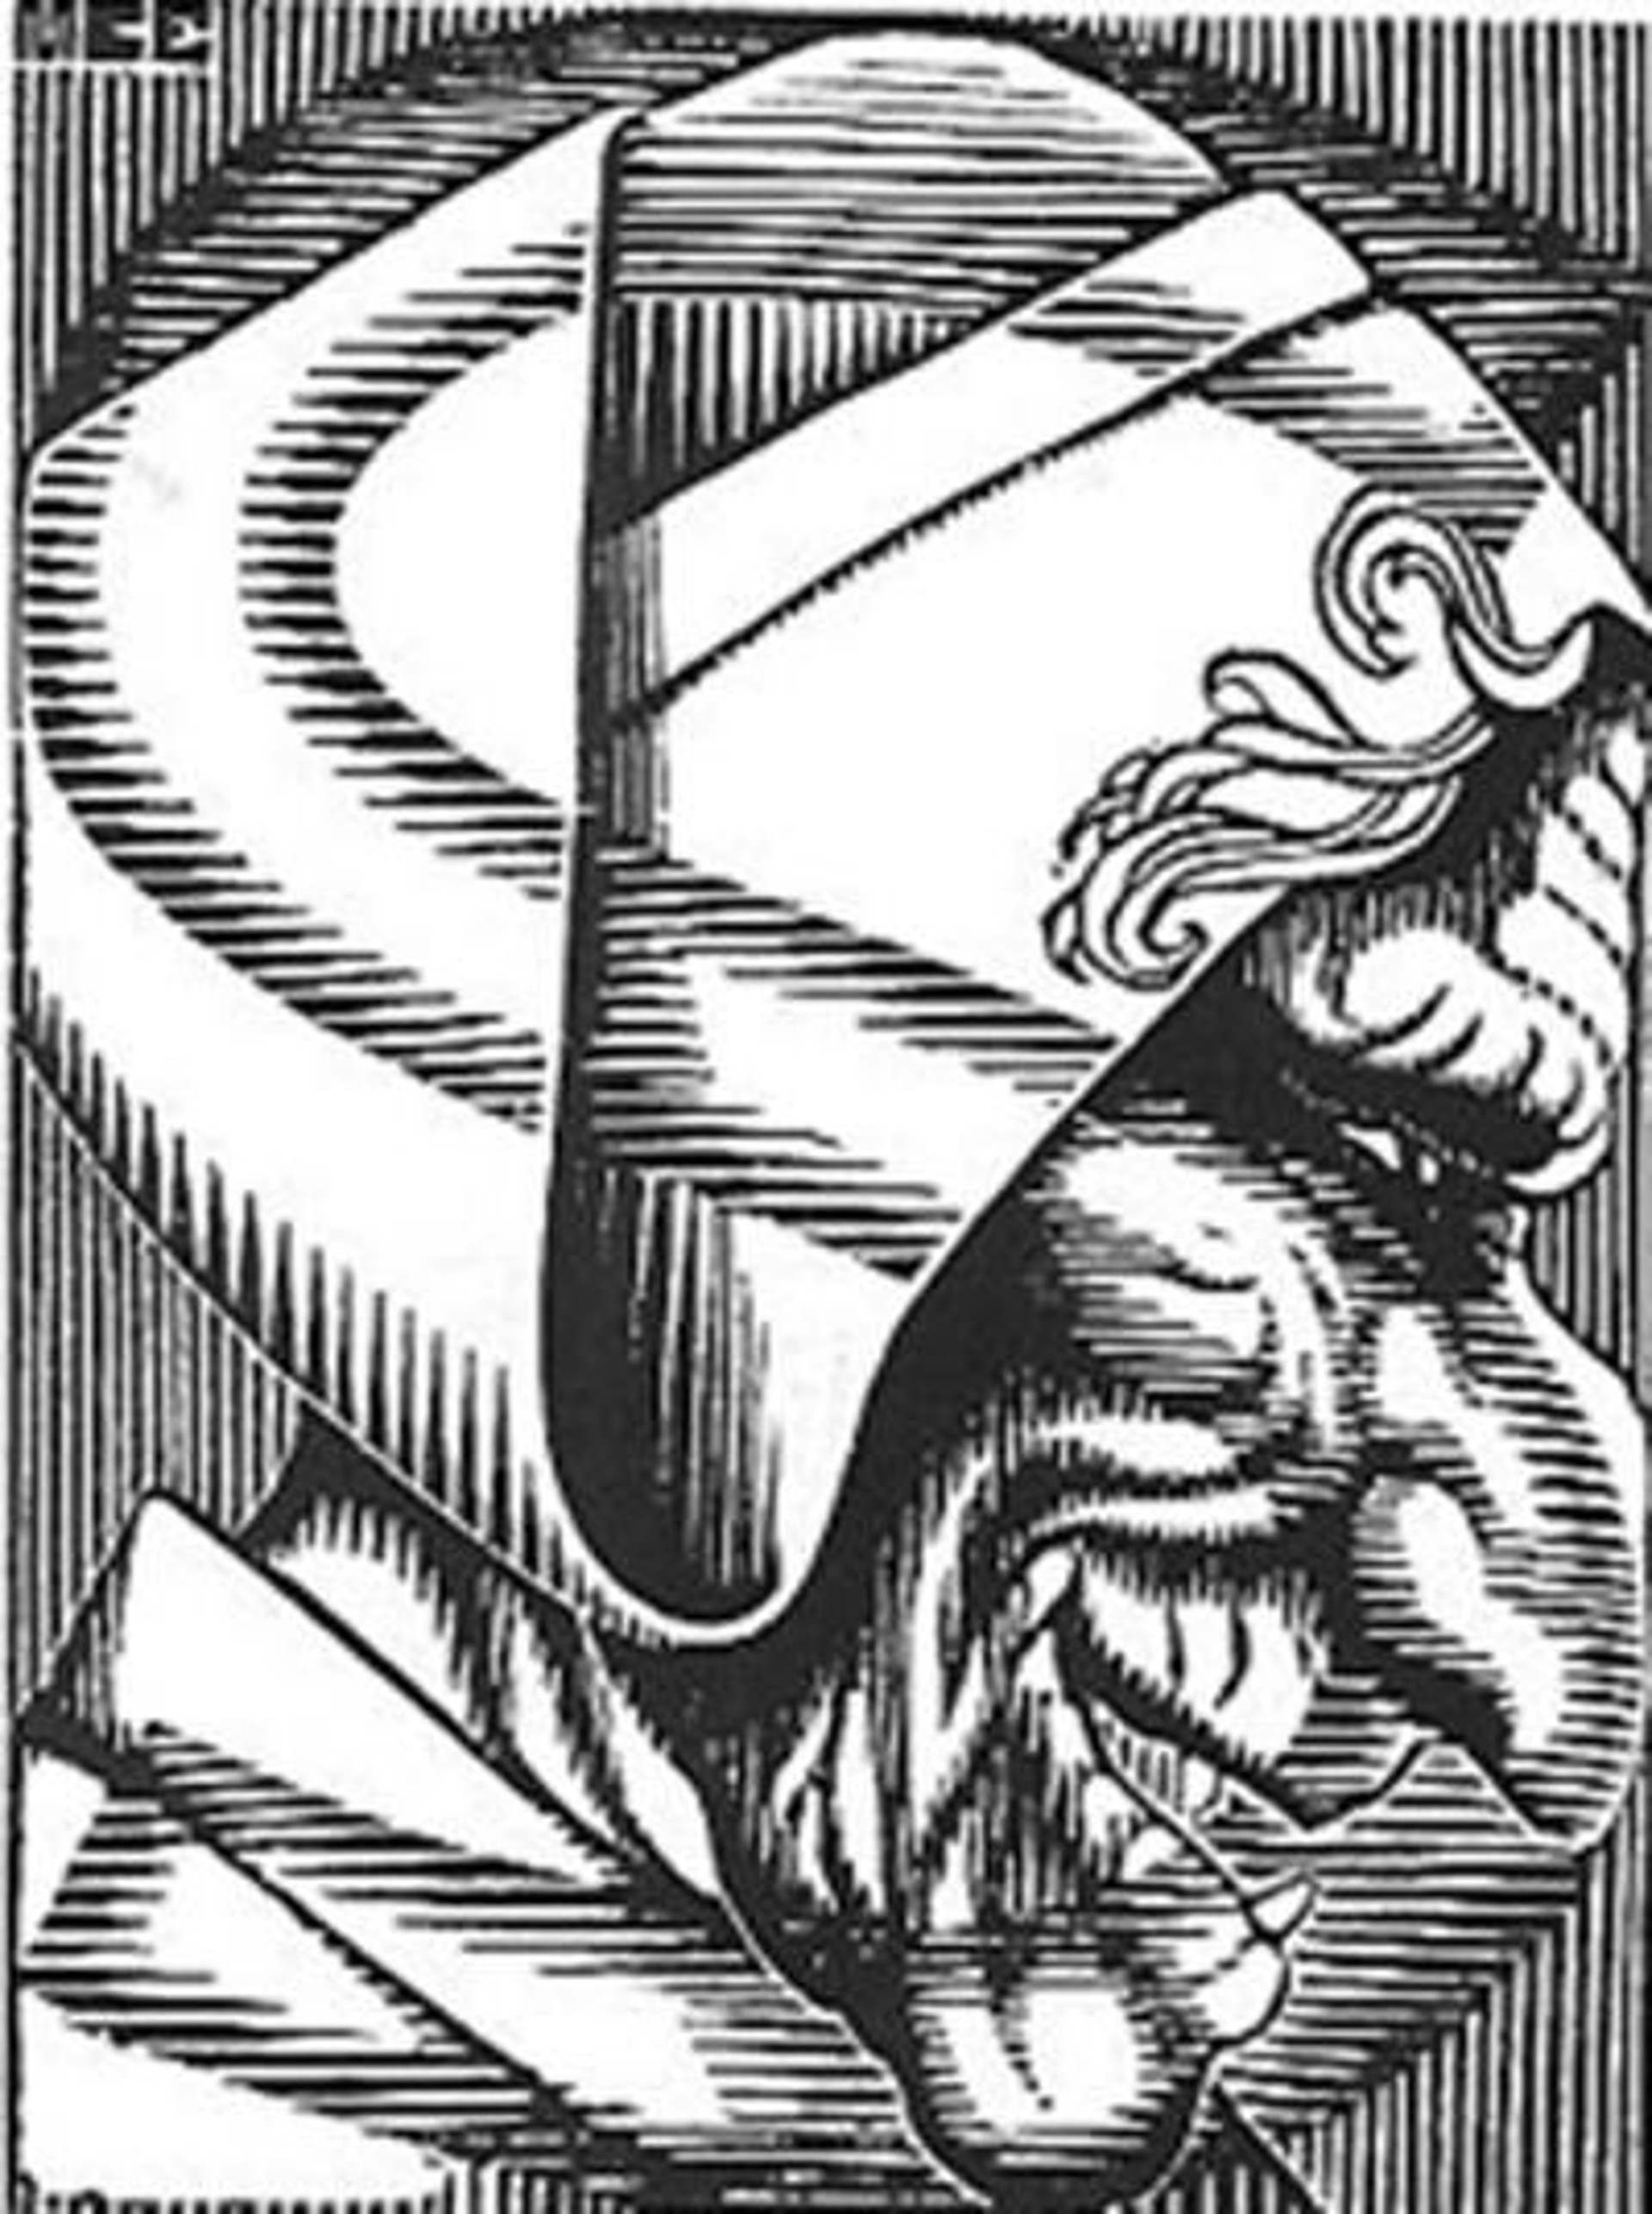 Scholastica - Initial S by M.C. Escher